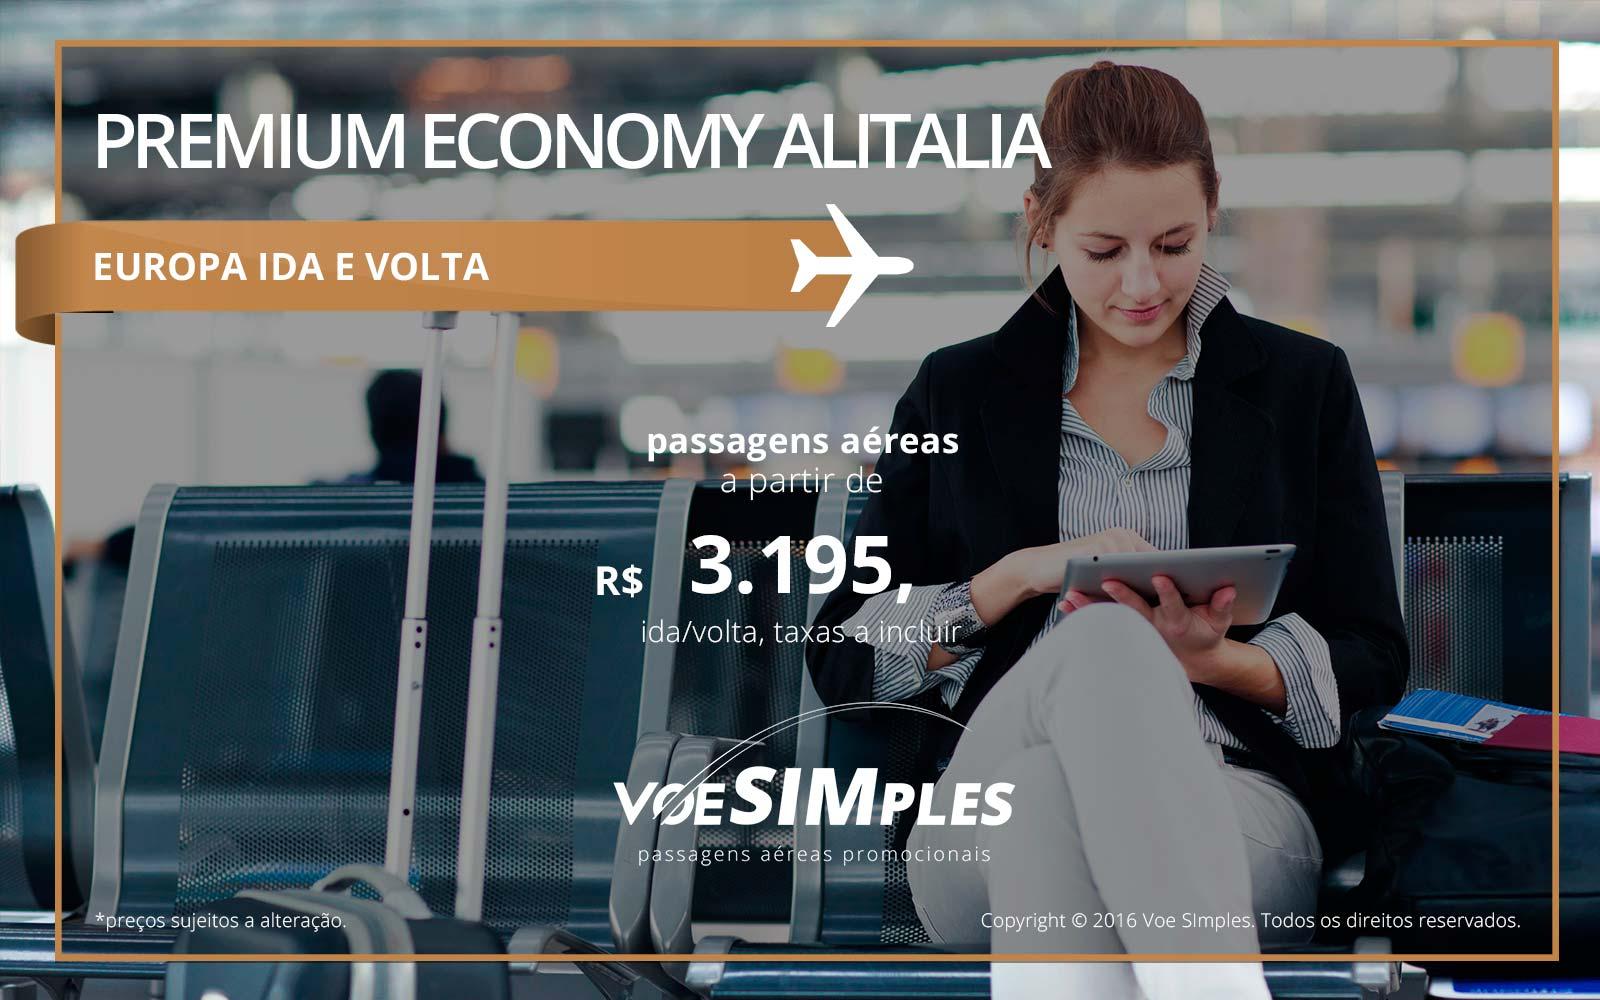 Passagem aérea Premium Economy Alitalia para Europa